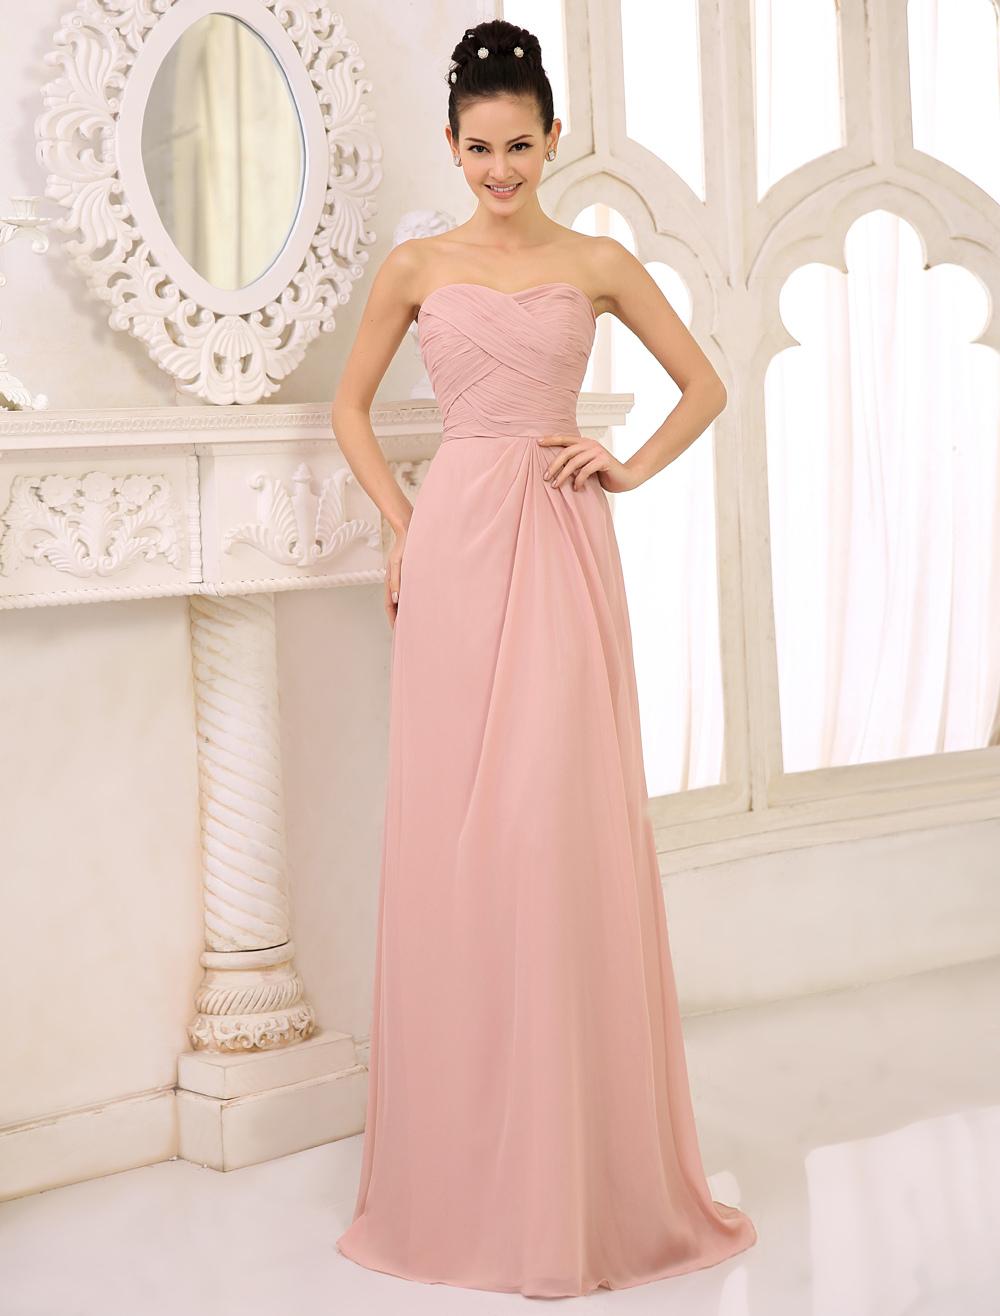 Bridesmaid dresses long blush pink strapless wedding party - Color rosa palo ...